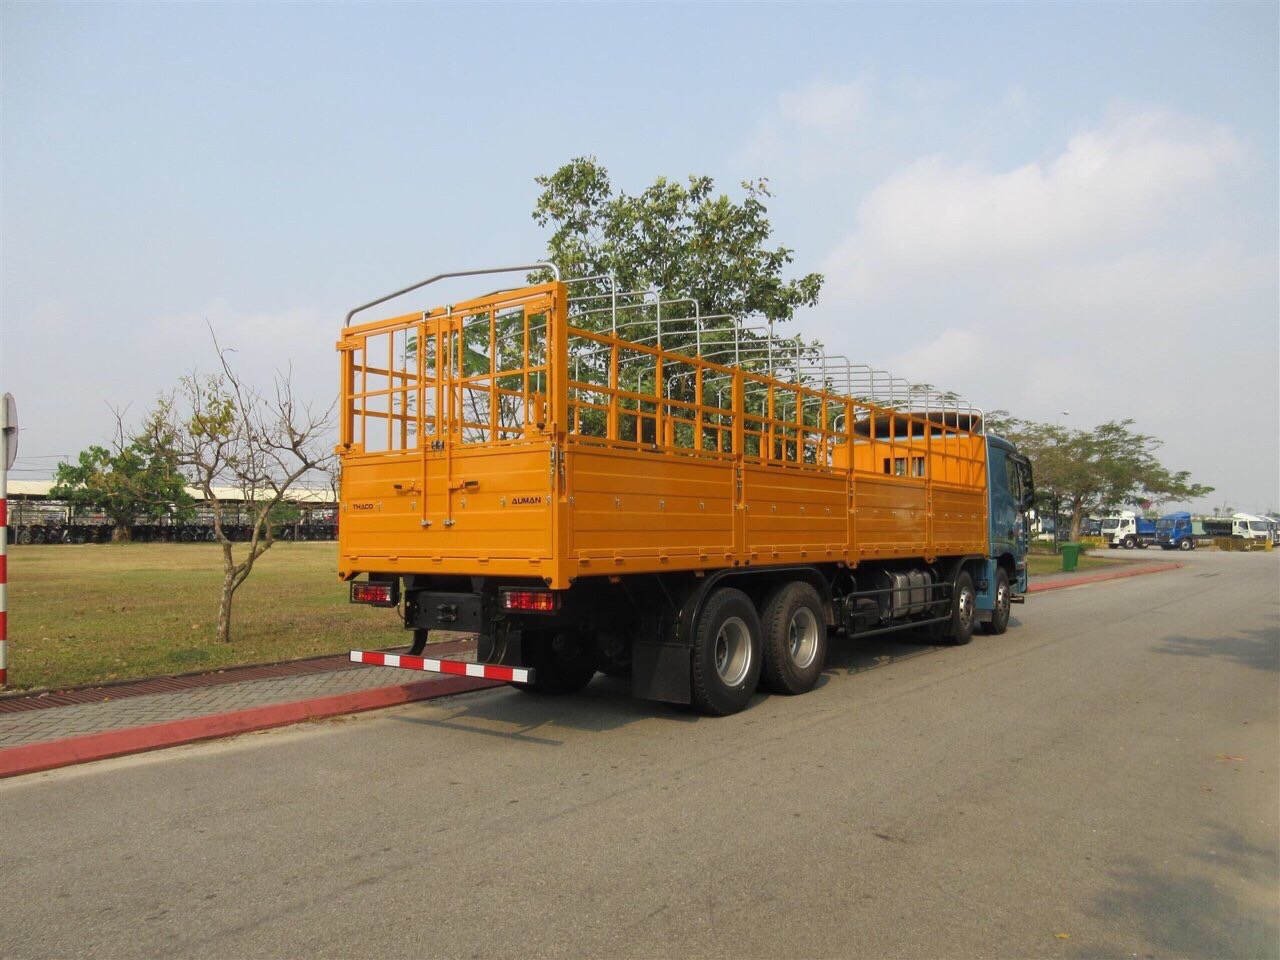 Giới thiệu Foton Auman EST C300 4 chân 17 tấn